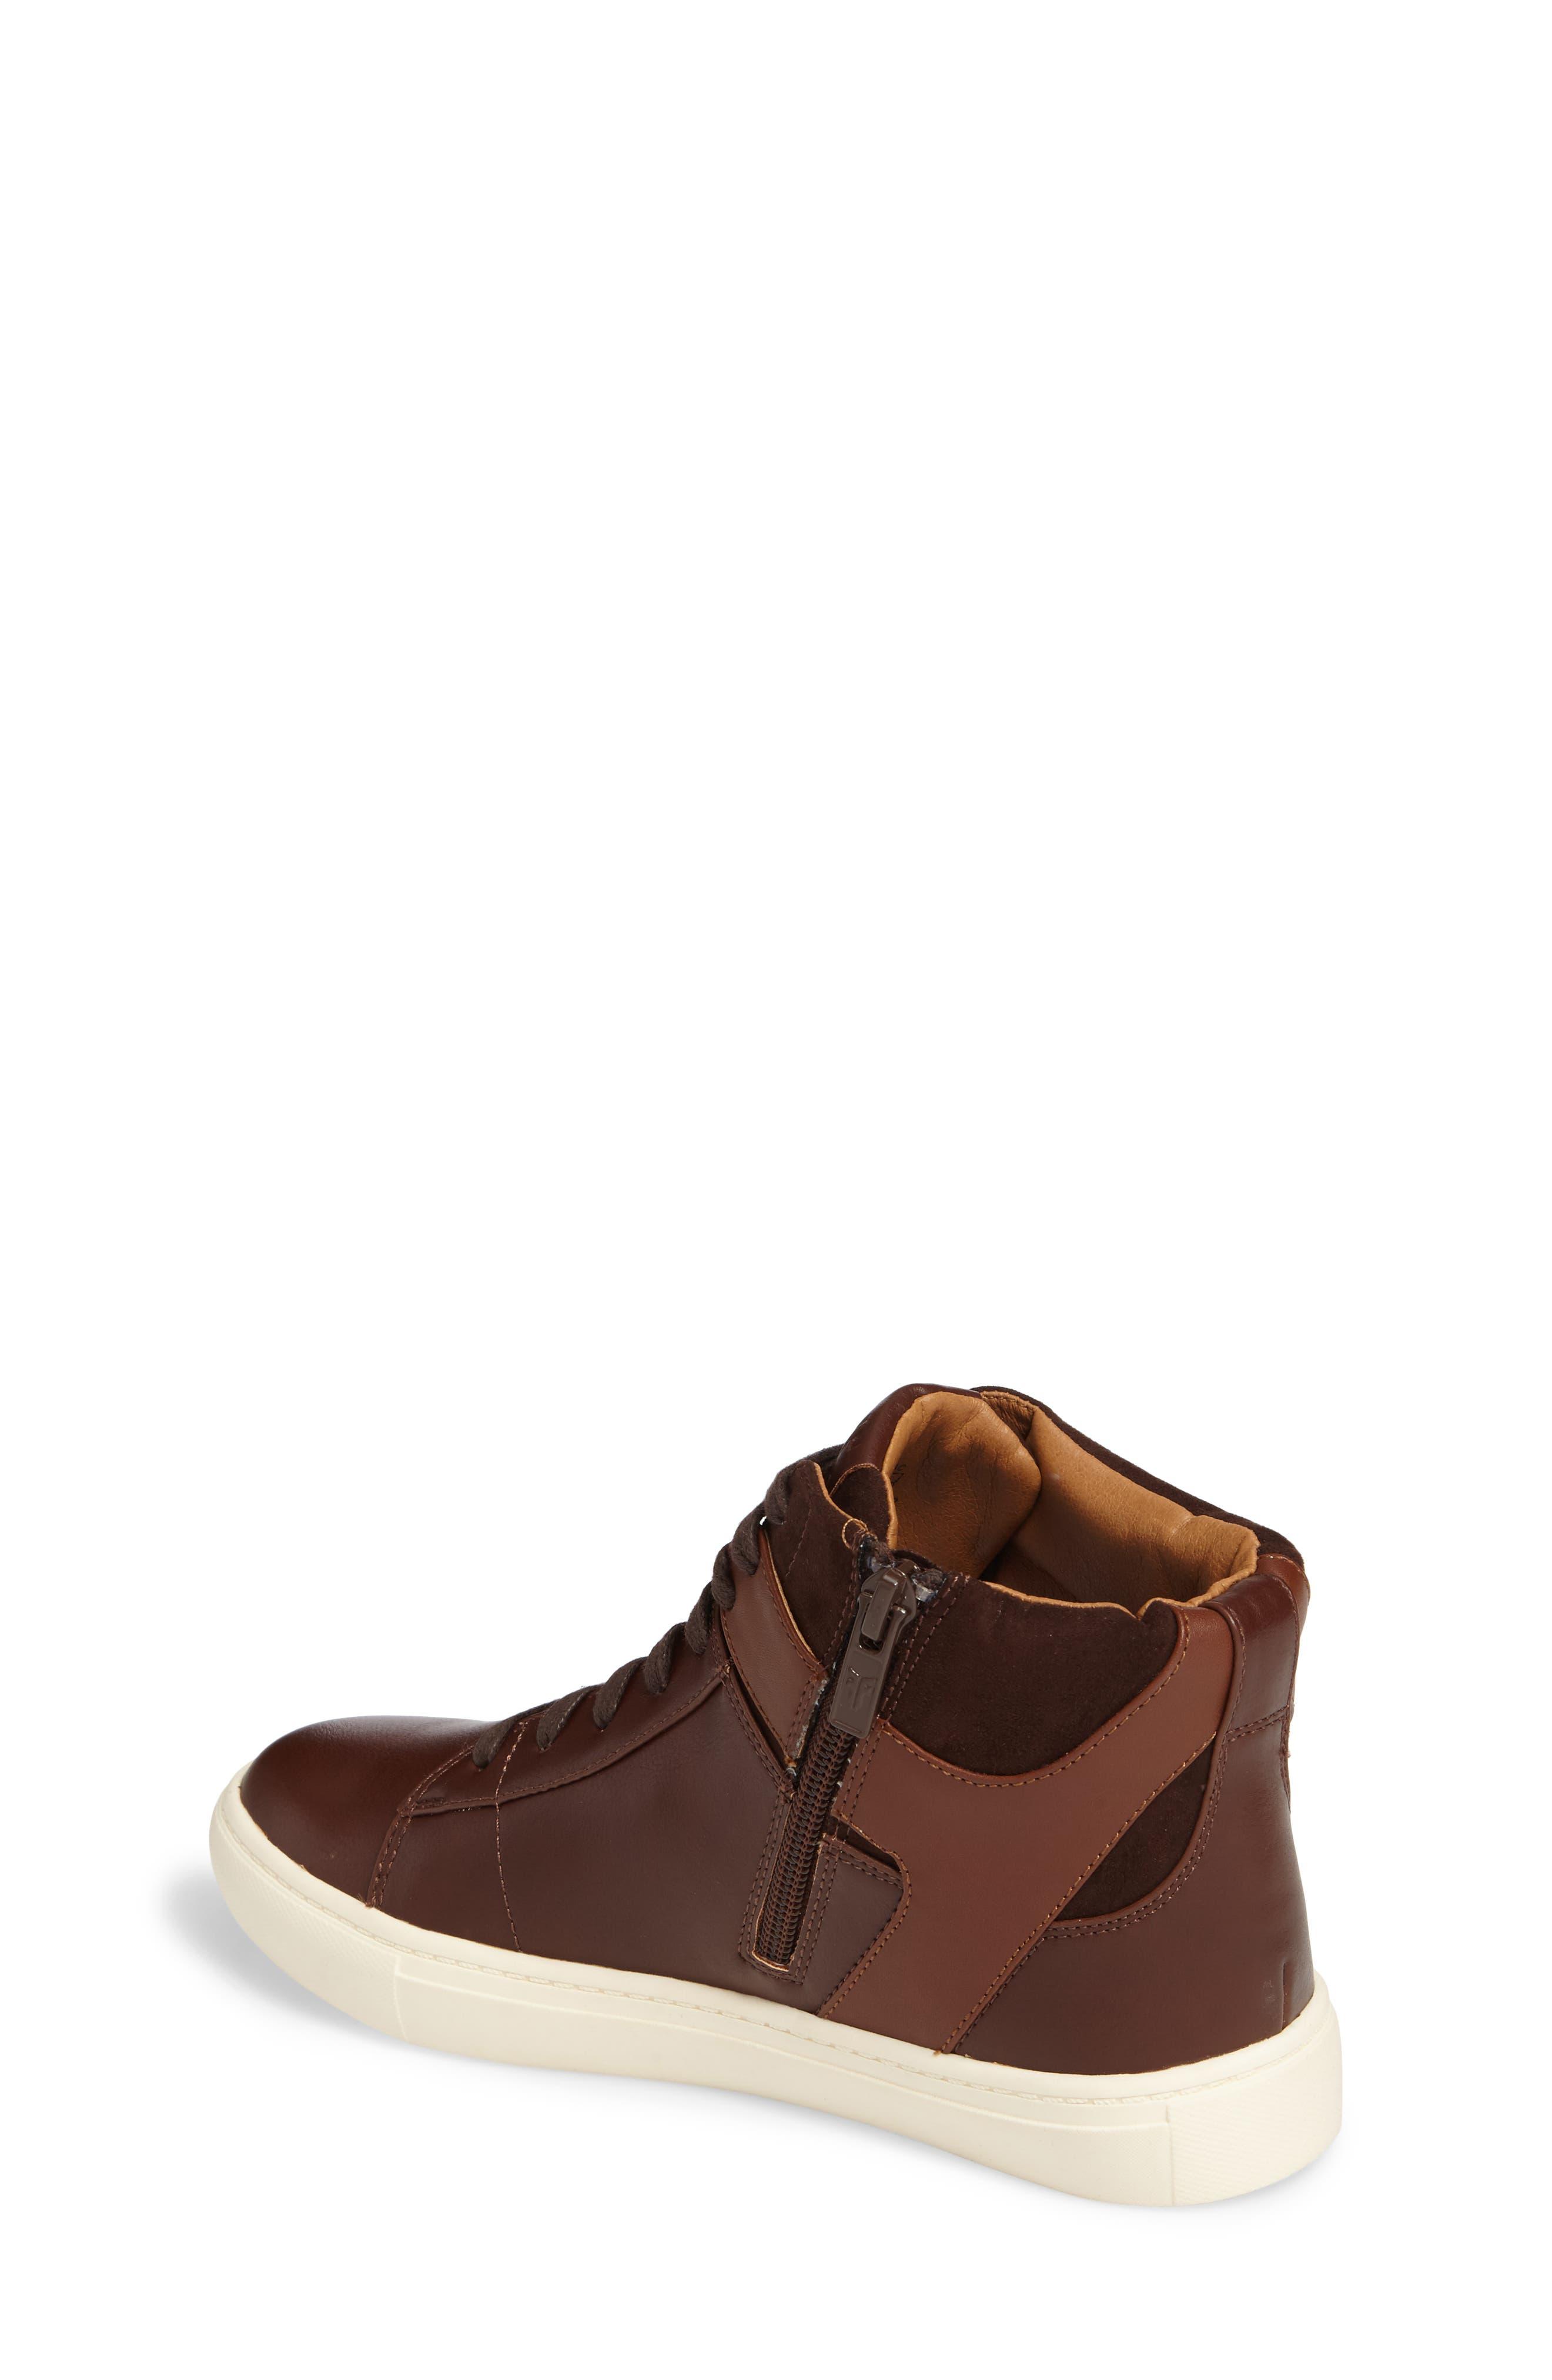 Mark High Top Sneaker,                             Alternate thumbnail 2, color,